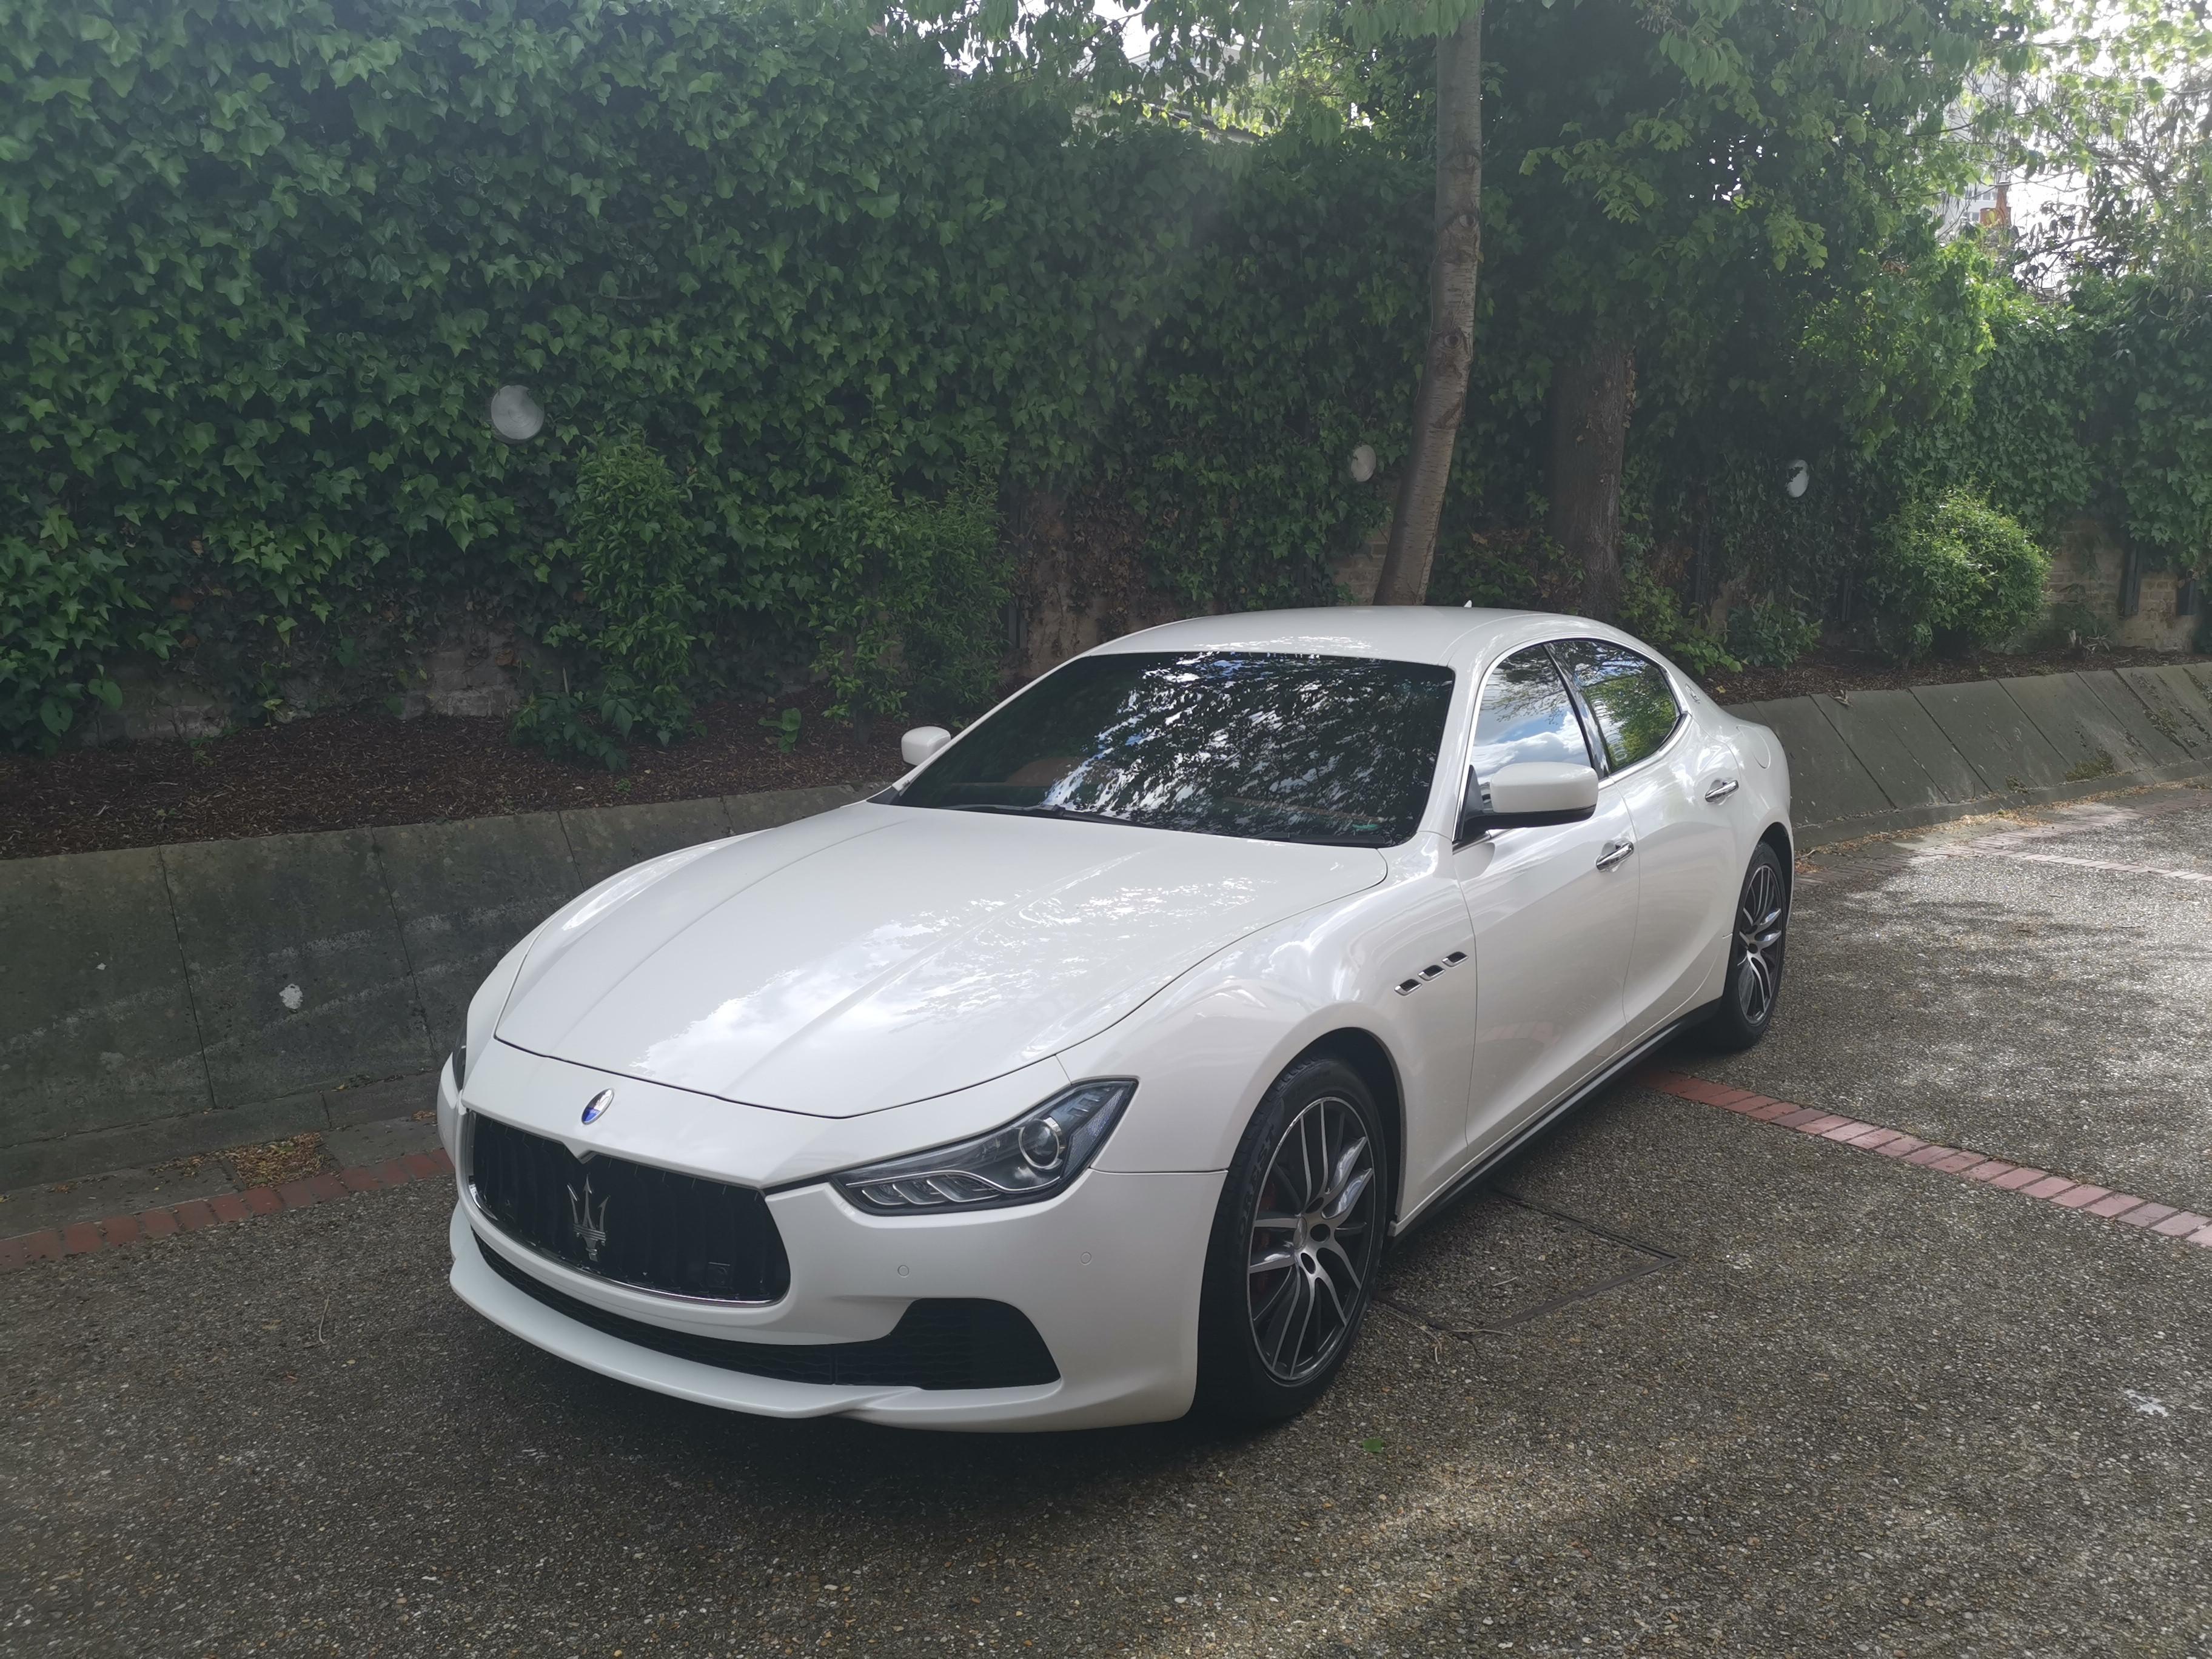 Maserati Ghibli Hire London